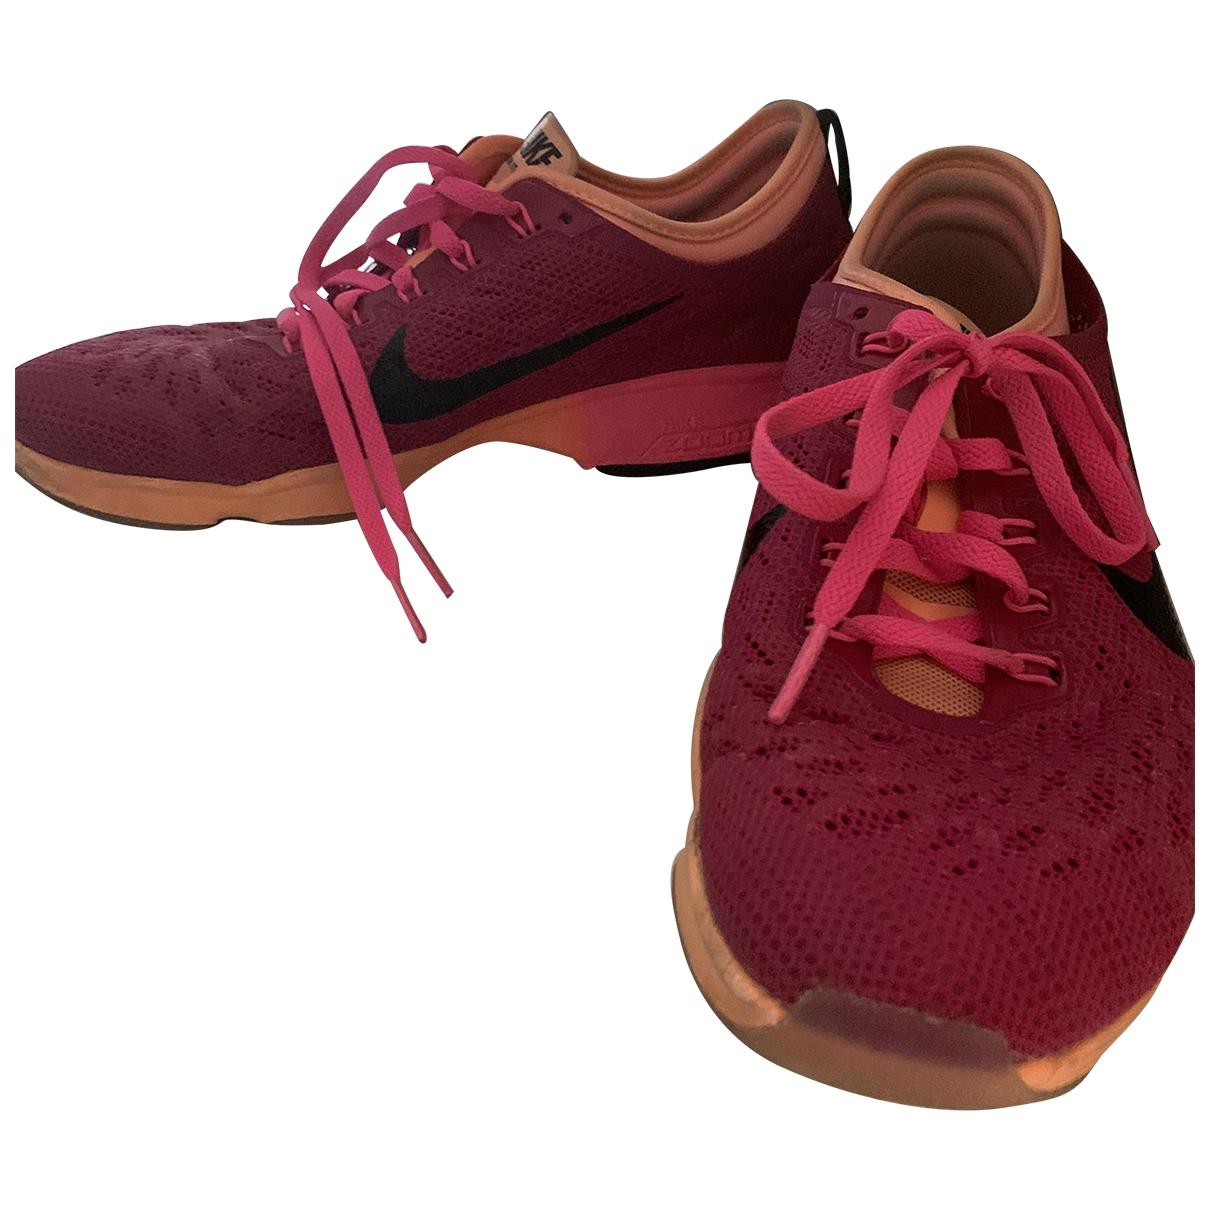 Nike Air Zoom Spiridon Sneakers in  Rosa Polyester